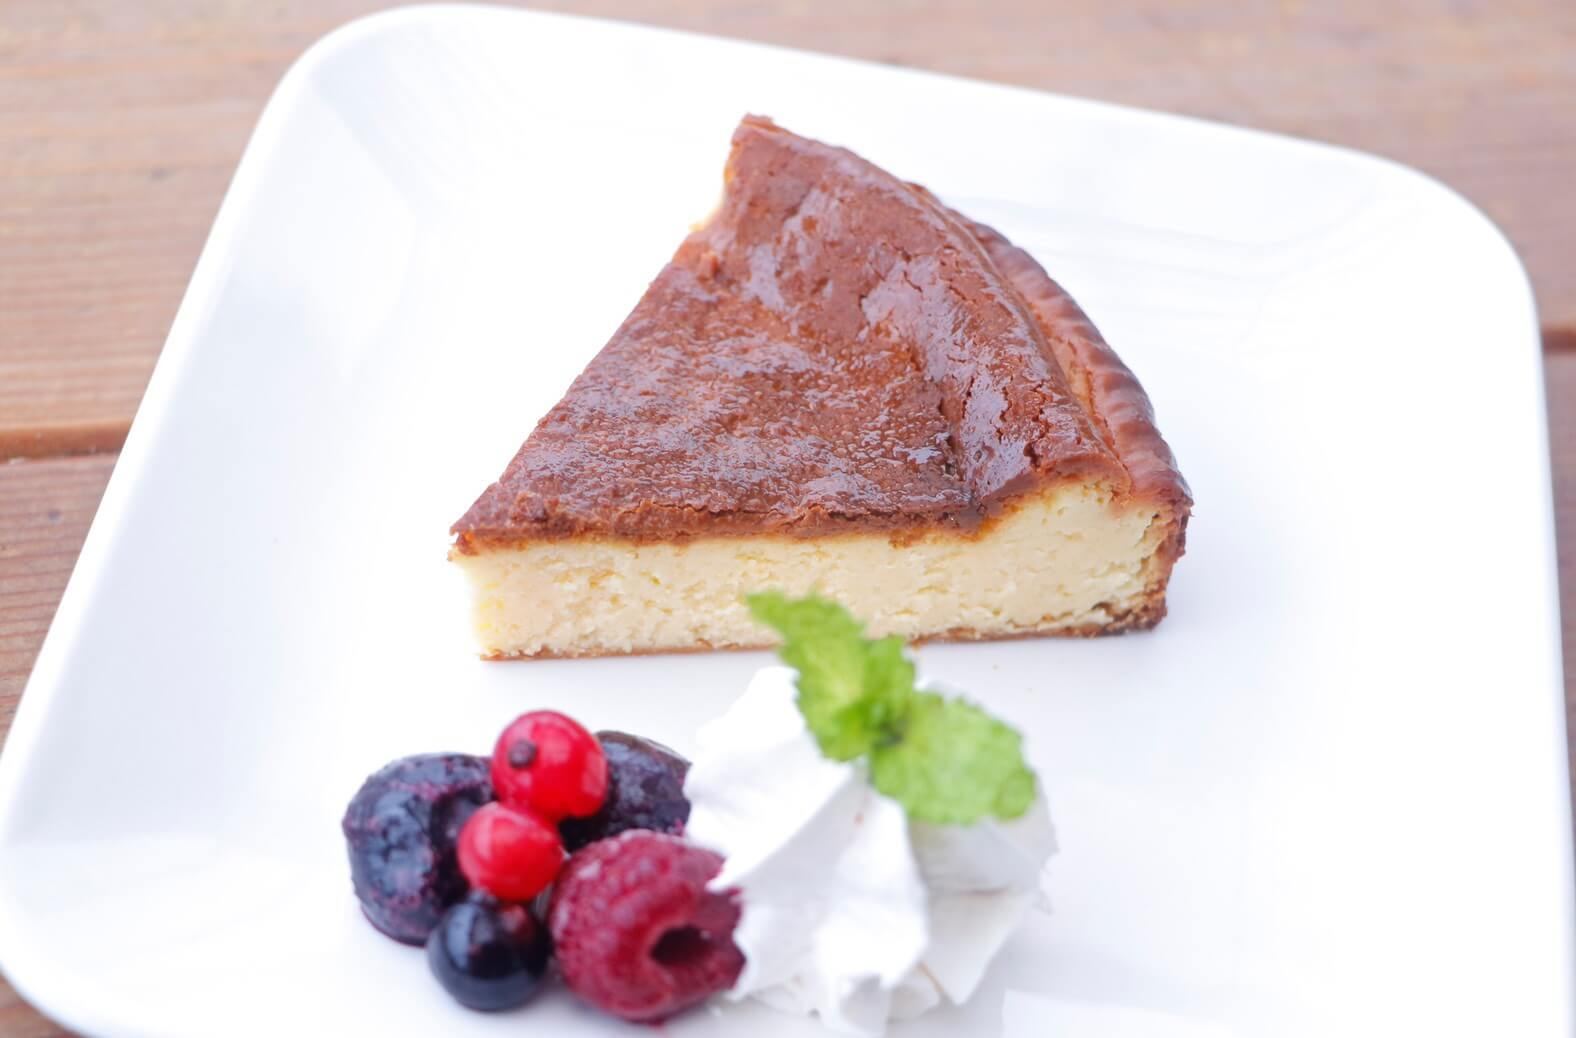 The Holiday LOUNGE(ザ ホリデイ ラウンジ)の糖質制限チーズケーキ/¥500(税込み)